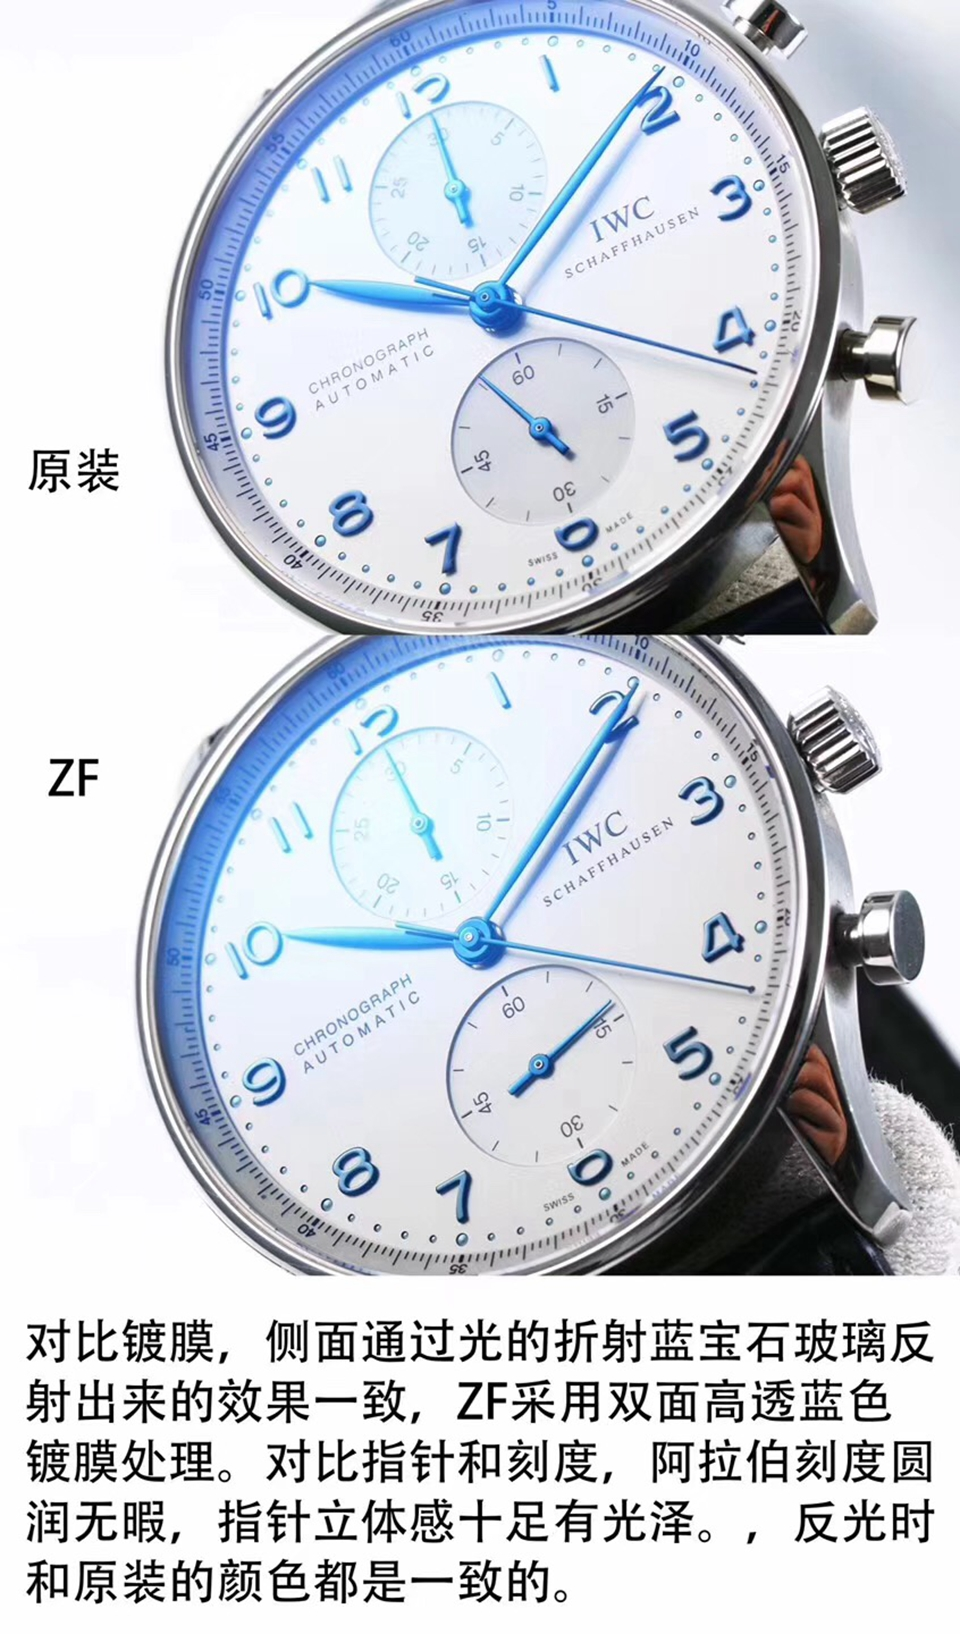 ZF万国表葡萄牙系列IW371446腕表(葡计蓝针)复刻表真假对比评测